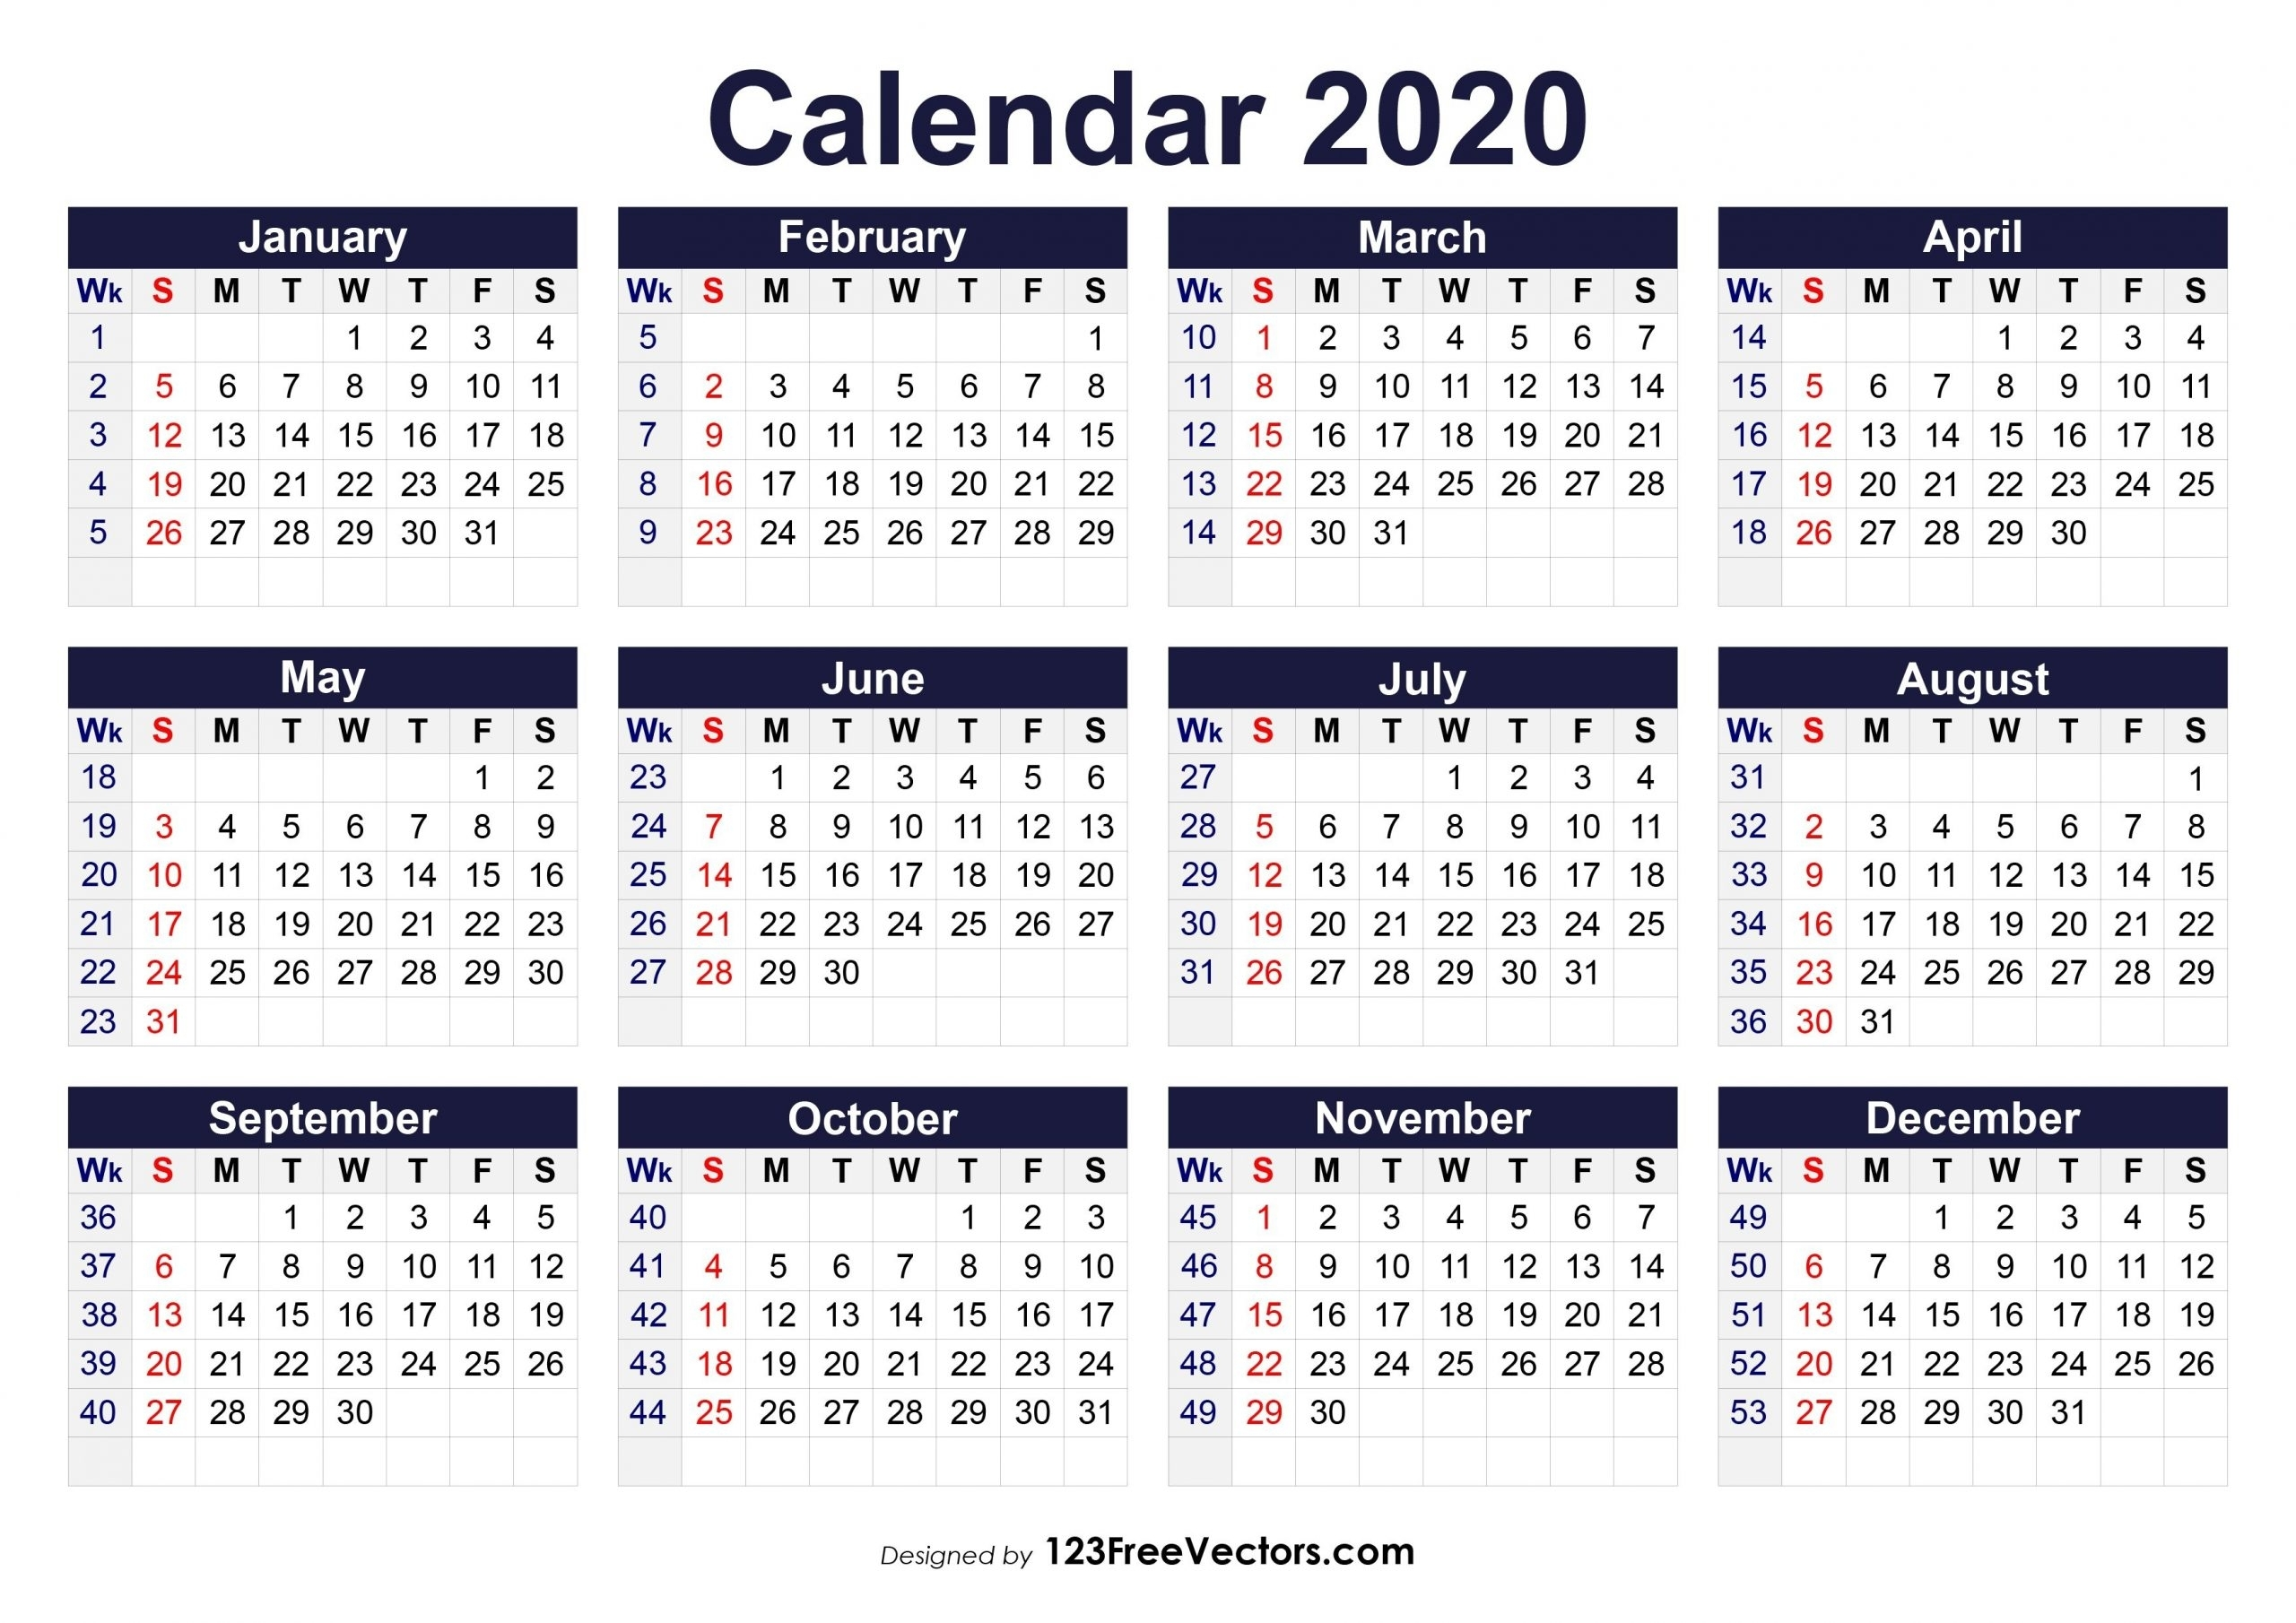 Catch Week Wise 2021 Calendar